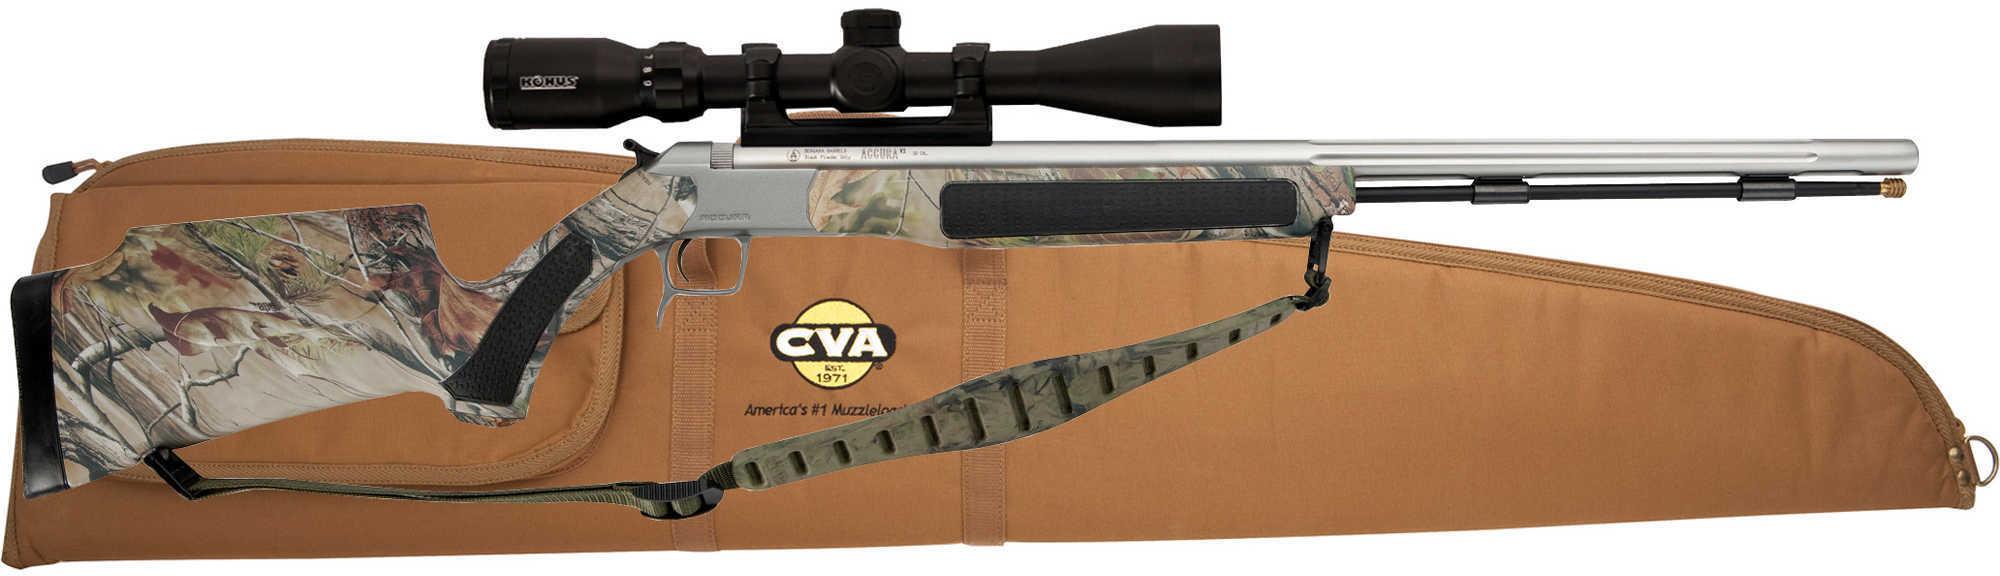 Cva Accura V2 Muzzleloader 50 Caliber Stainless Steel Camo Scope And Case